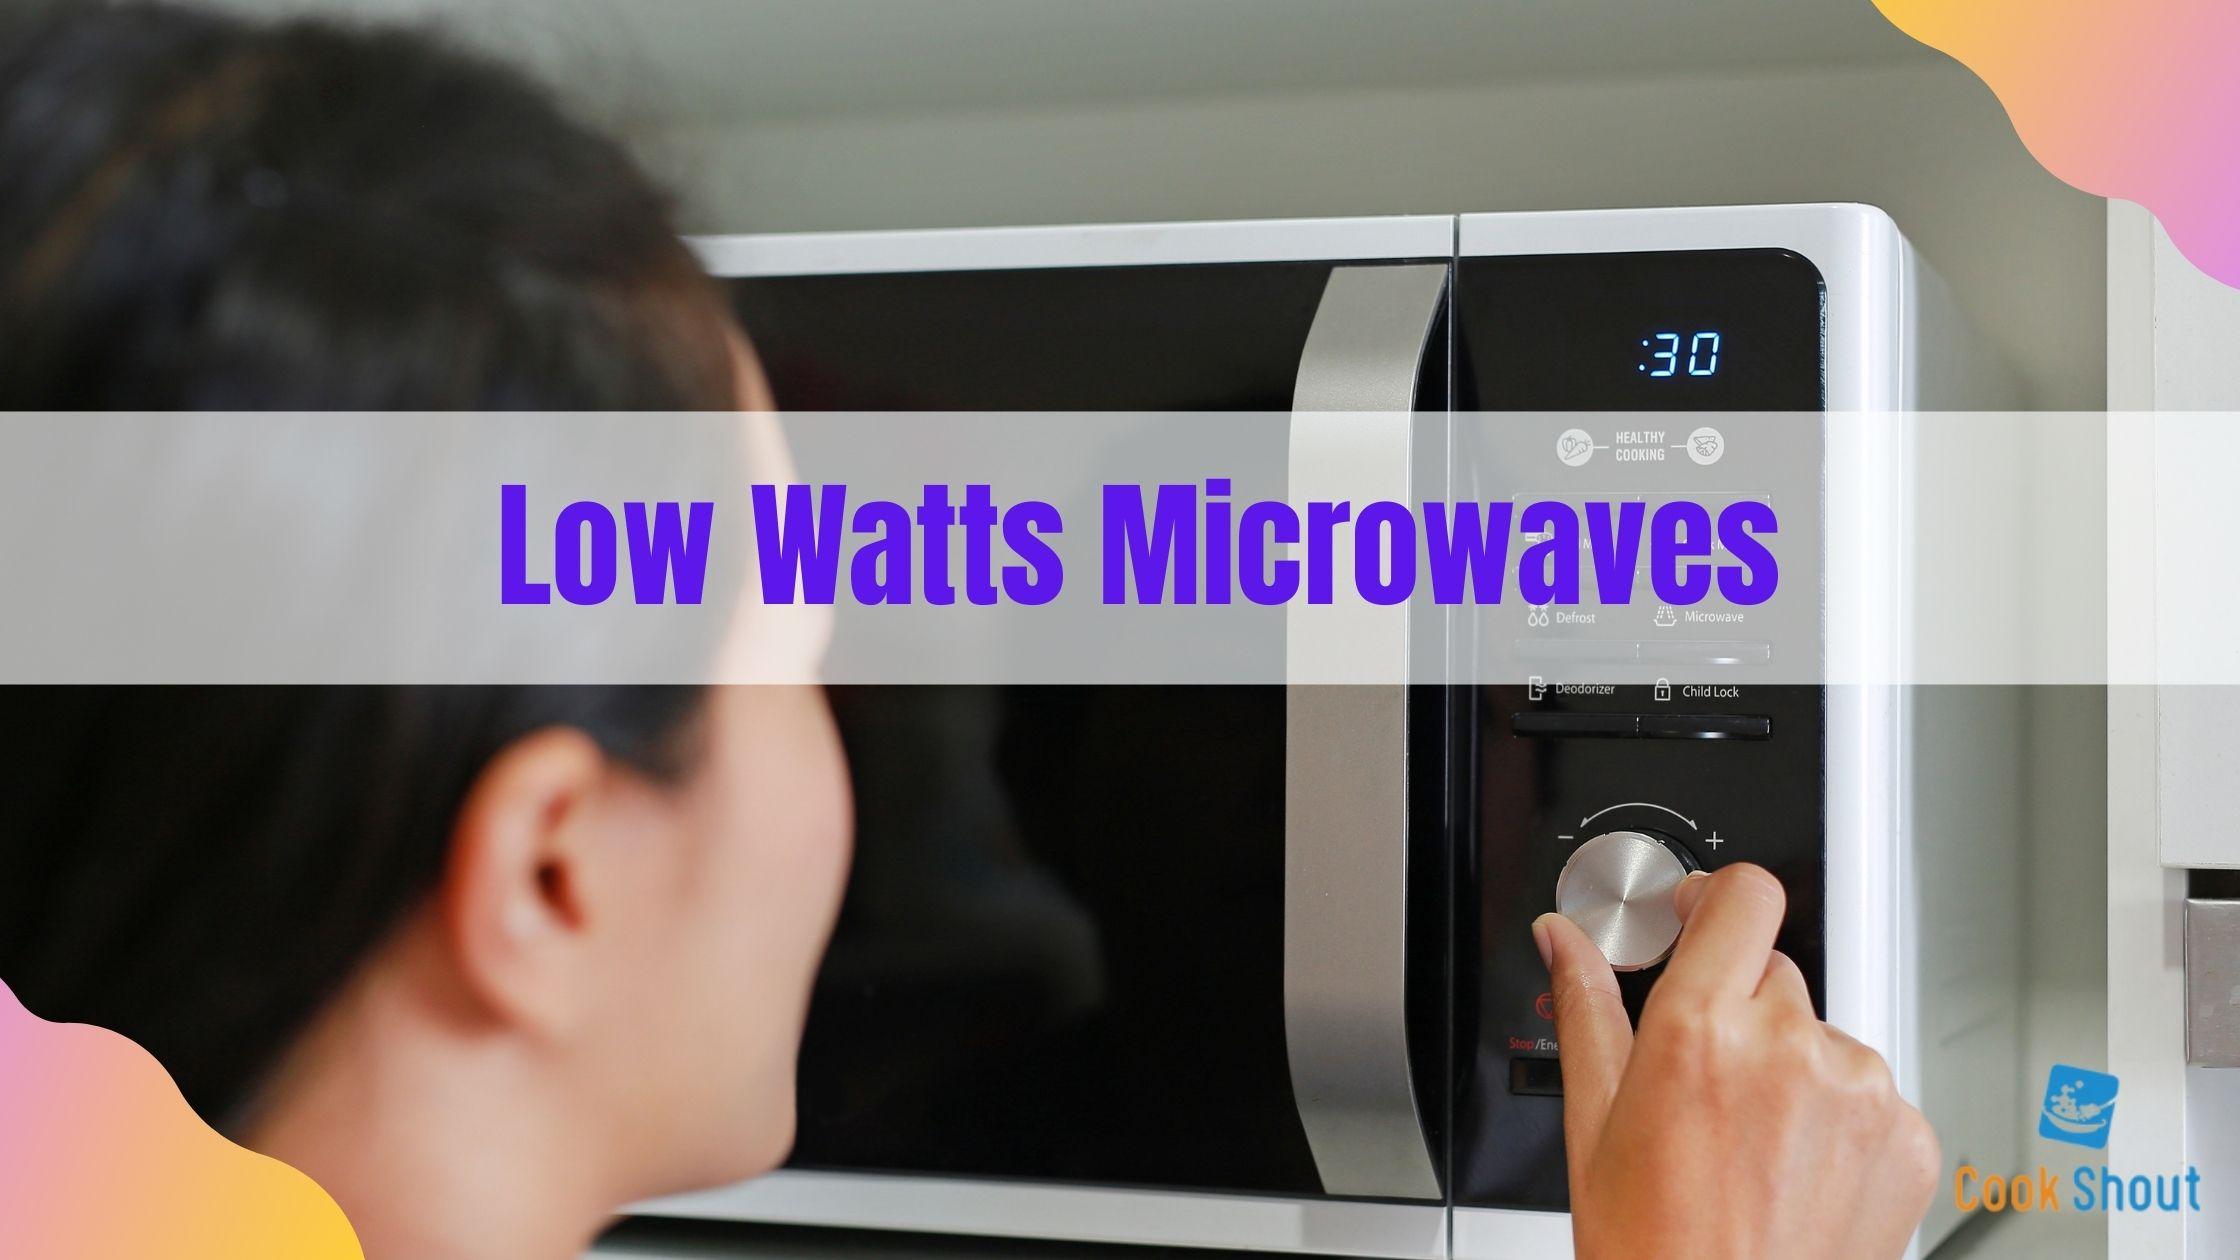 Low Watts Microwaves